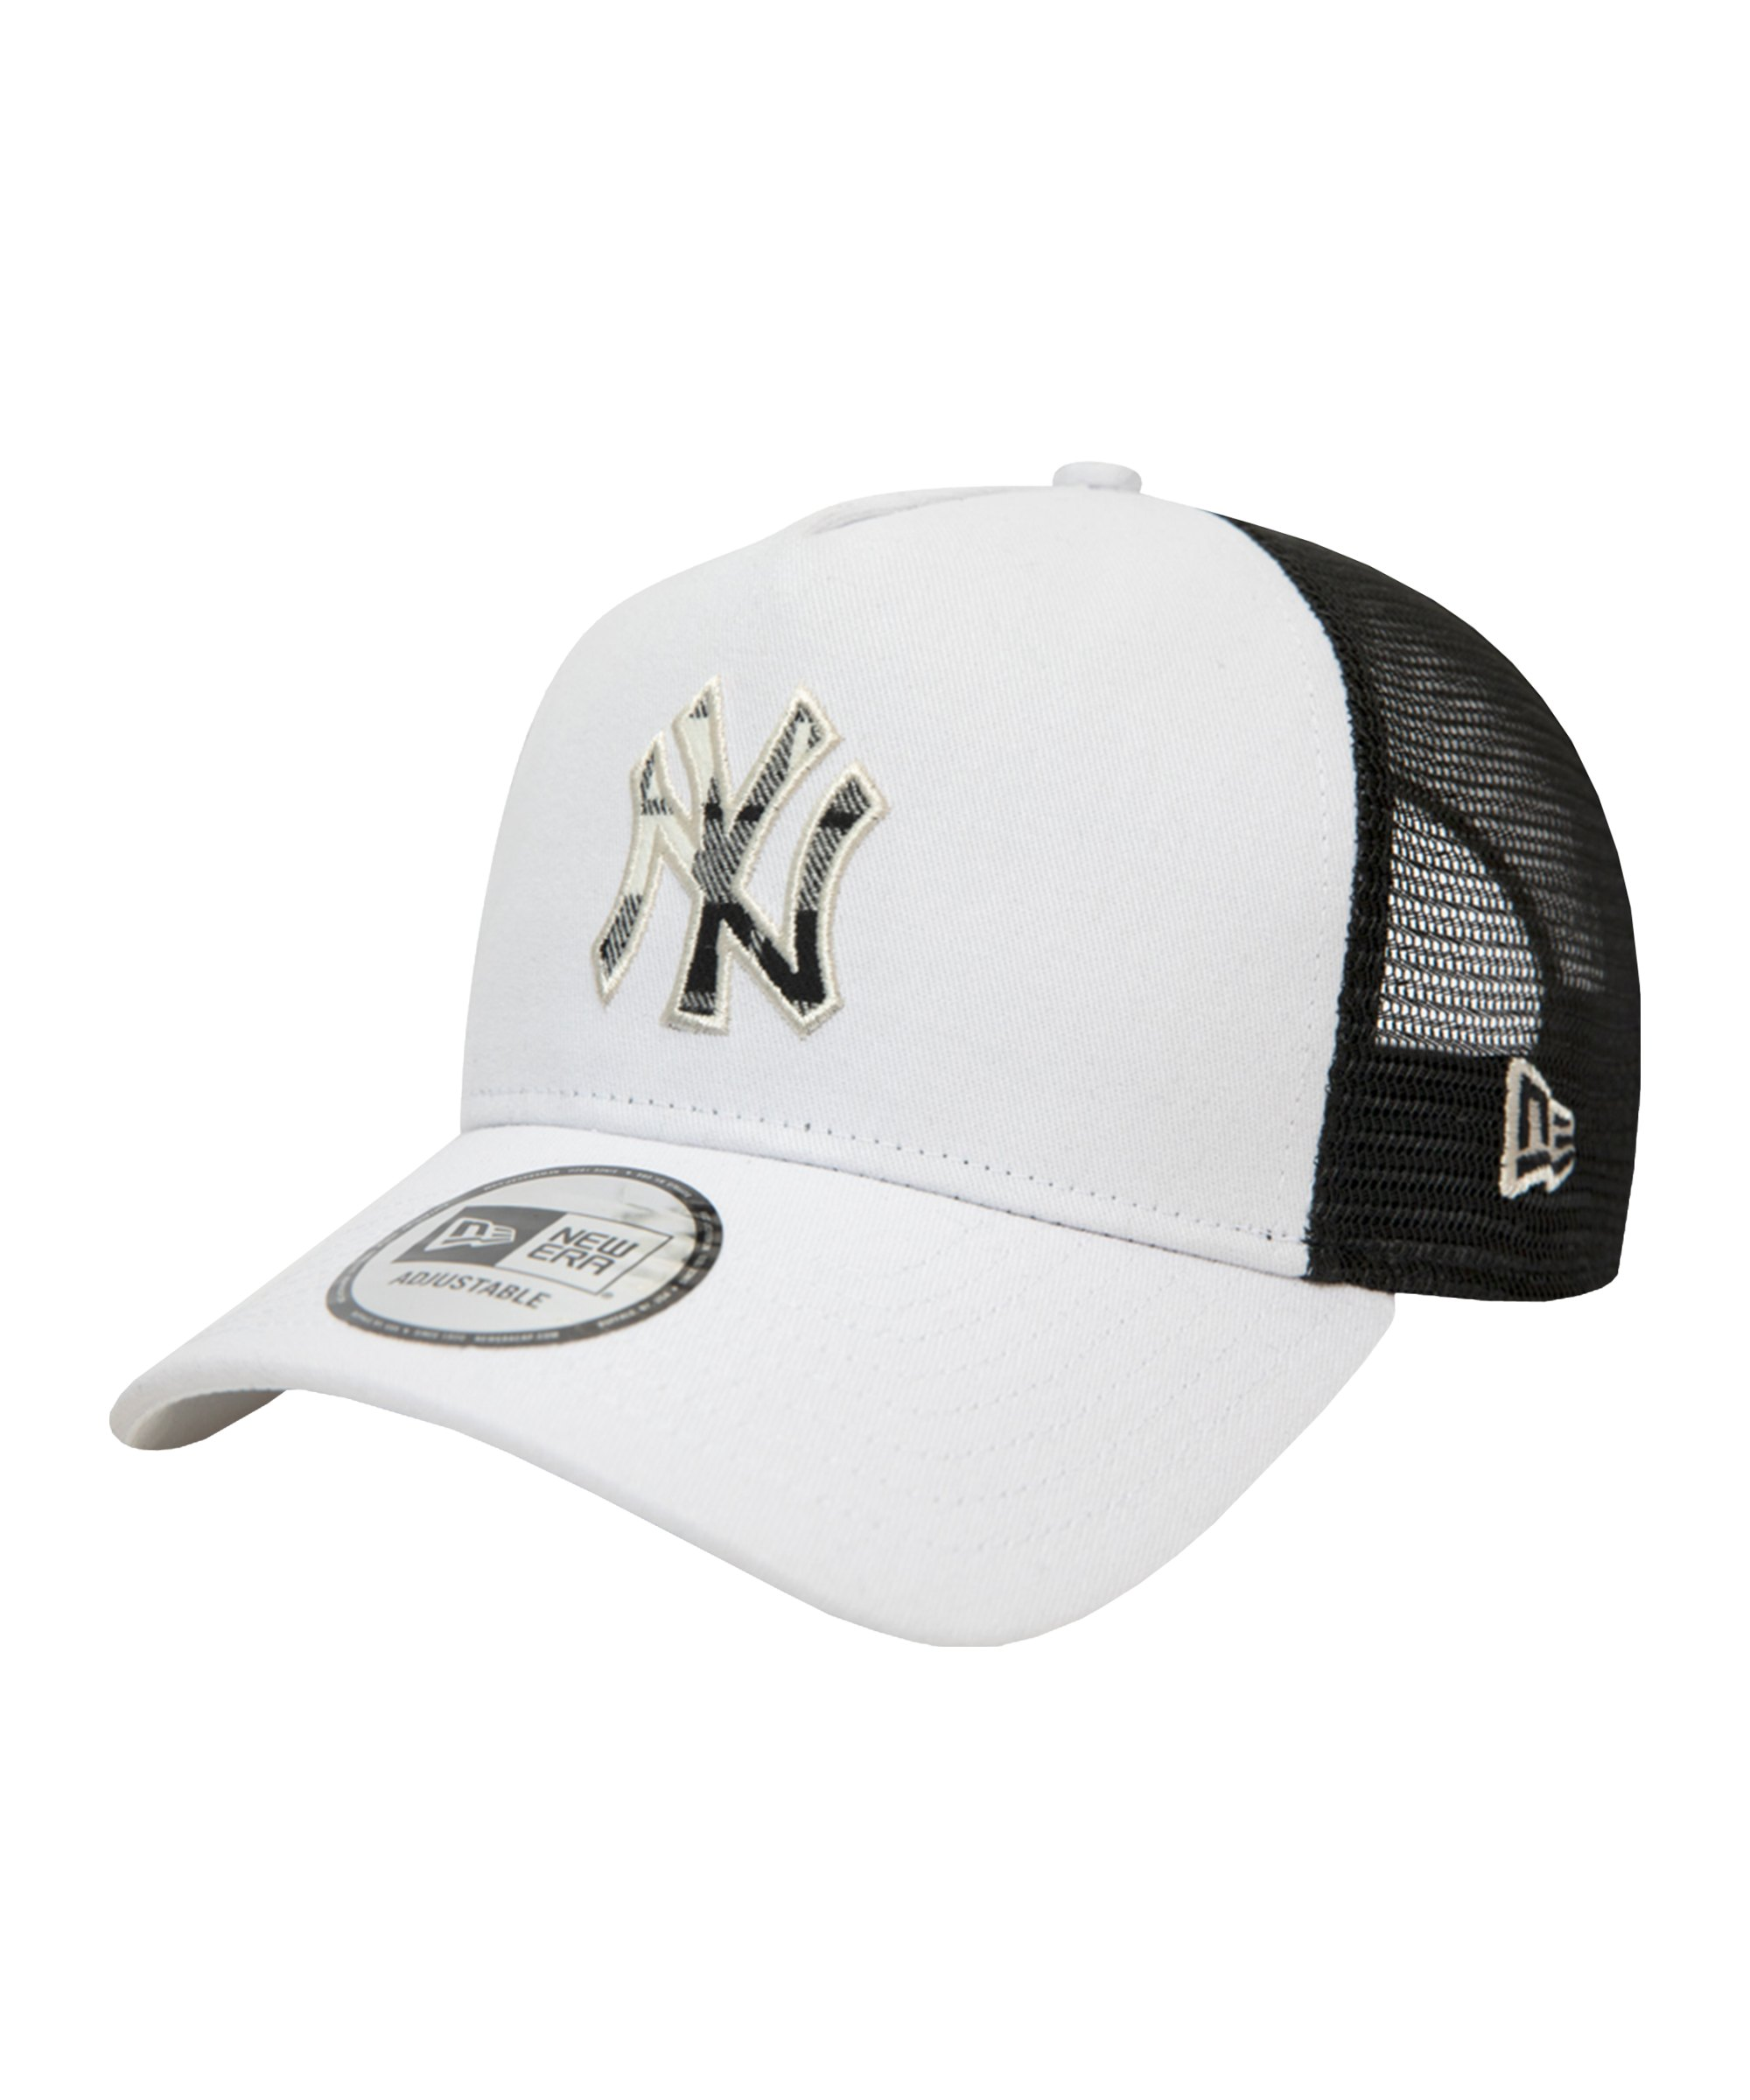 New Era NY Yankees Outline Trucker Cap Beige FSTN - beige